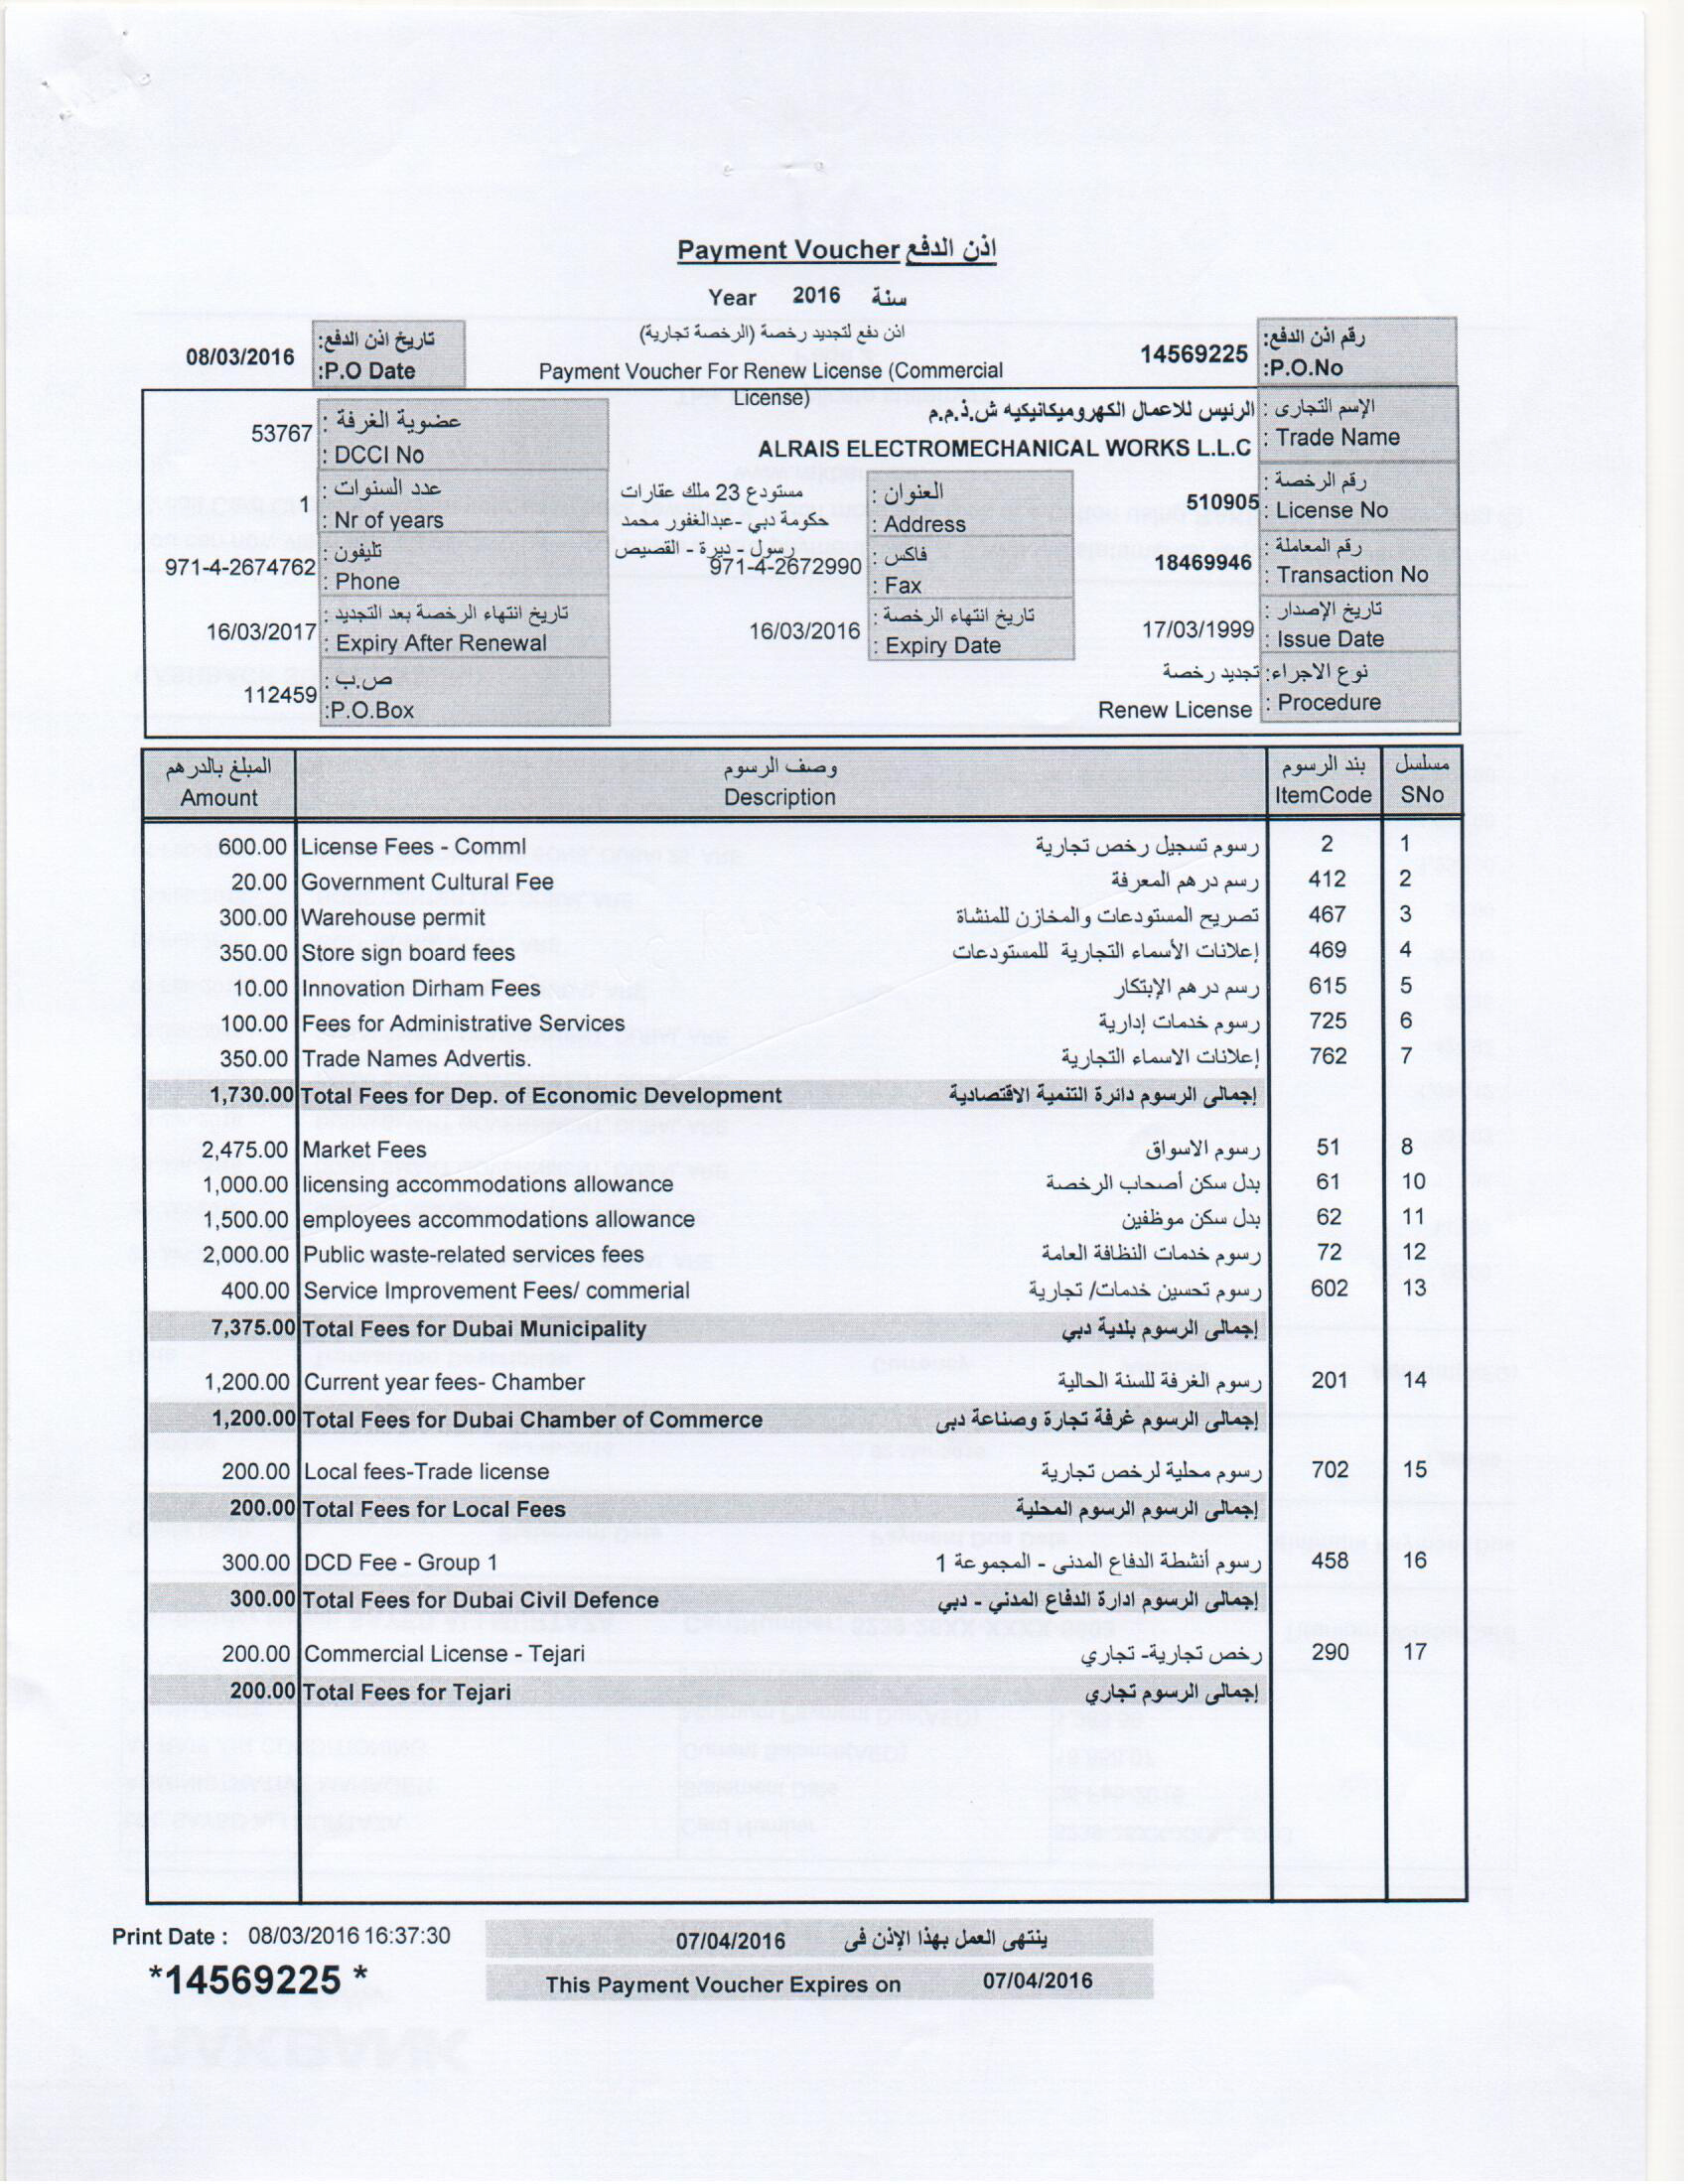 Al Rais Electromechanical Works L L C